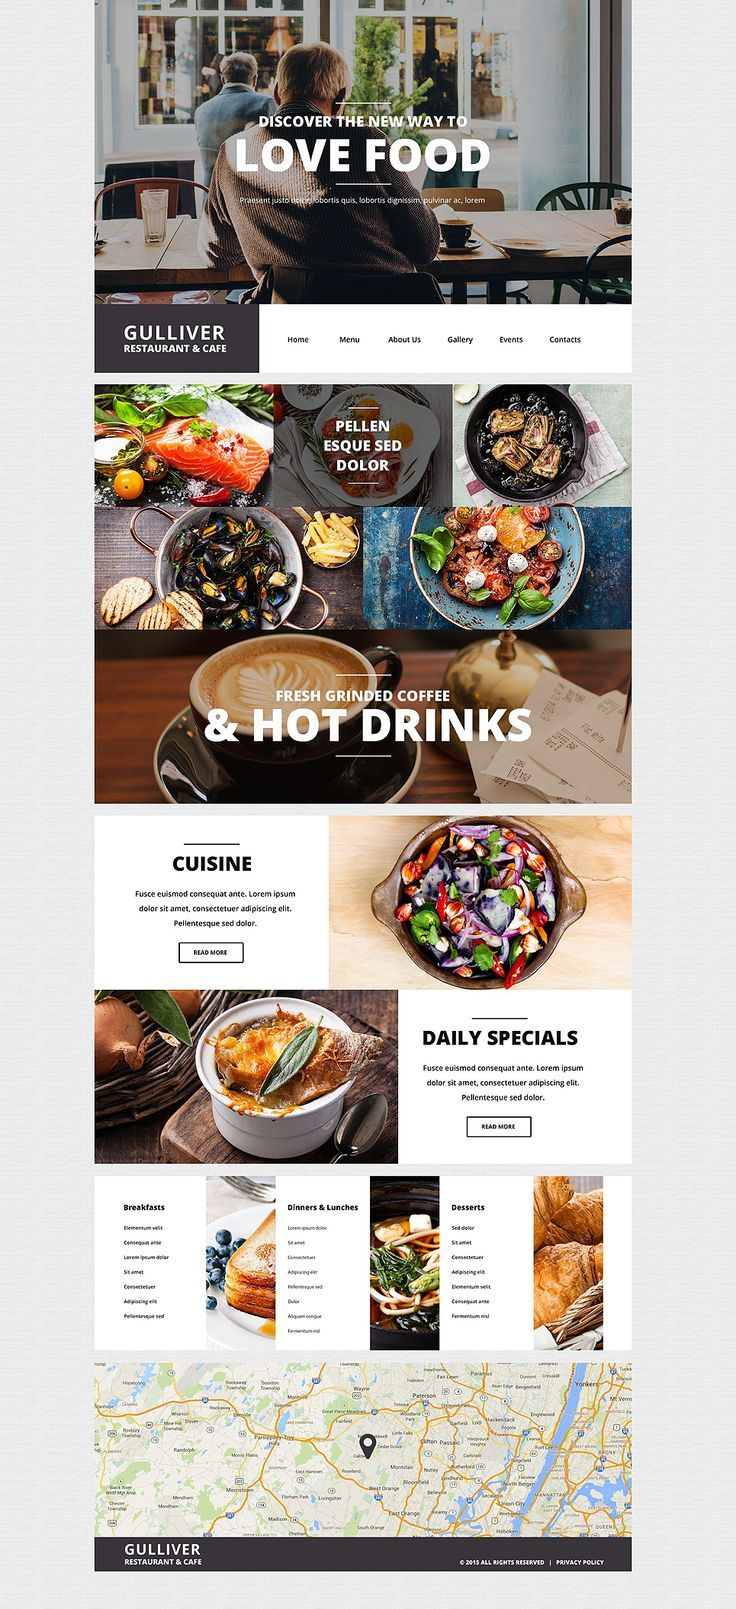 Cafe & Restaurant WordPress Theme #food http://www.templatemonster.com/wordpress-themes/55438.html?utm_source=pinterest&utm_medium=timeline&utm_campaign=55438